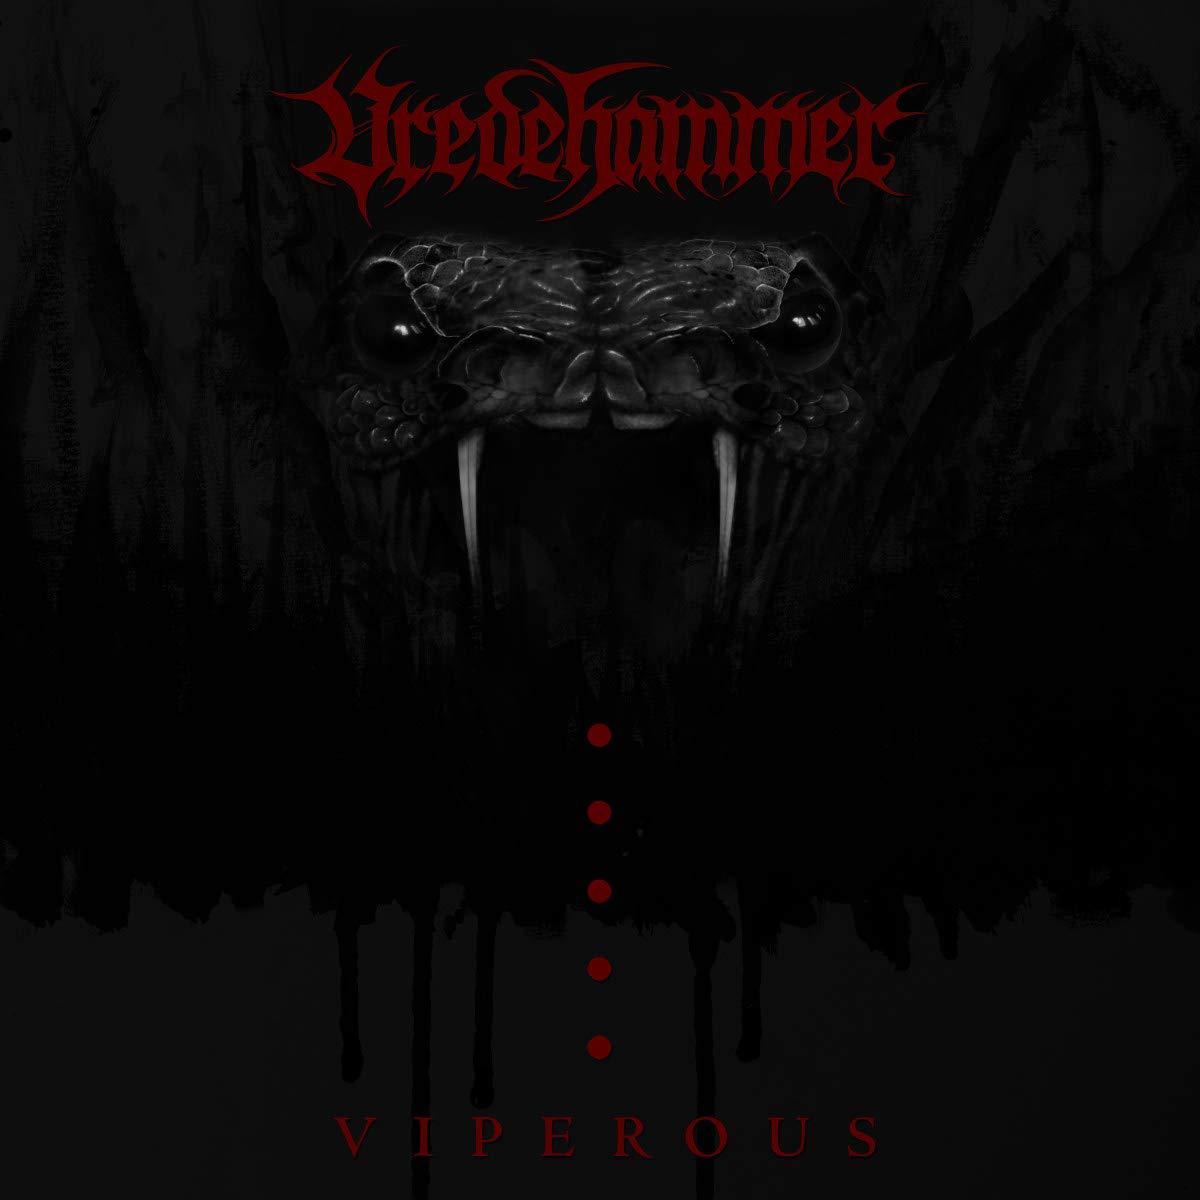 Viperous - Vredehammer - Musik - PHD MUSIC - 7072805004944 - 6. mars 2020